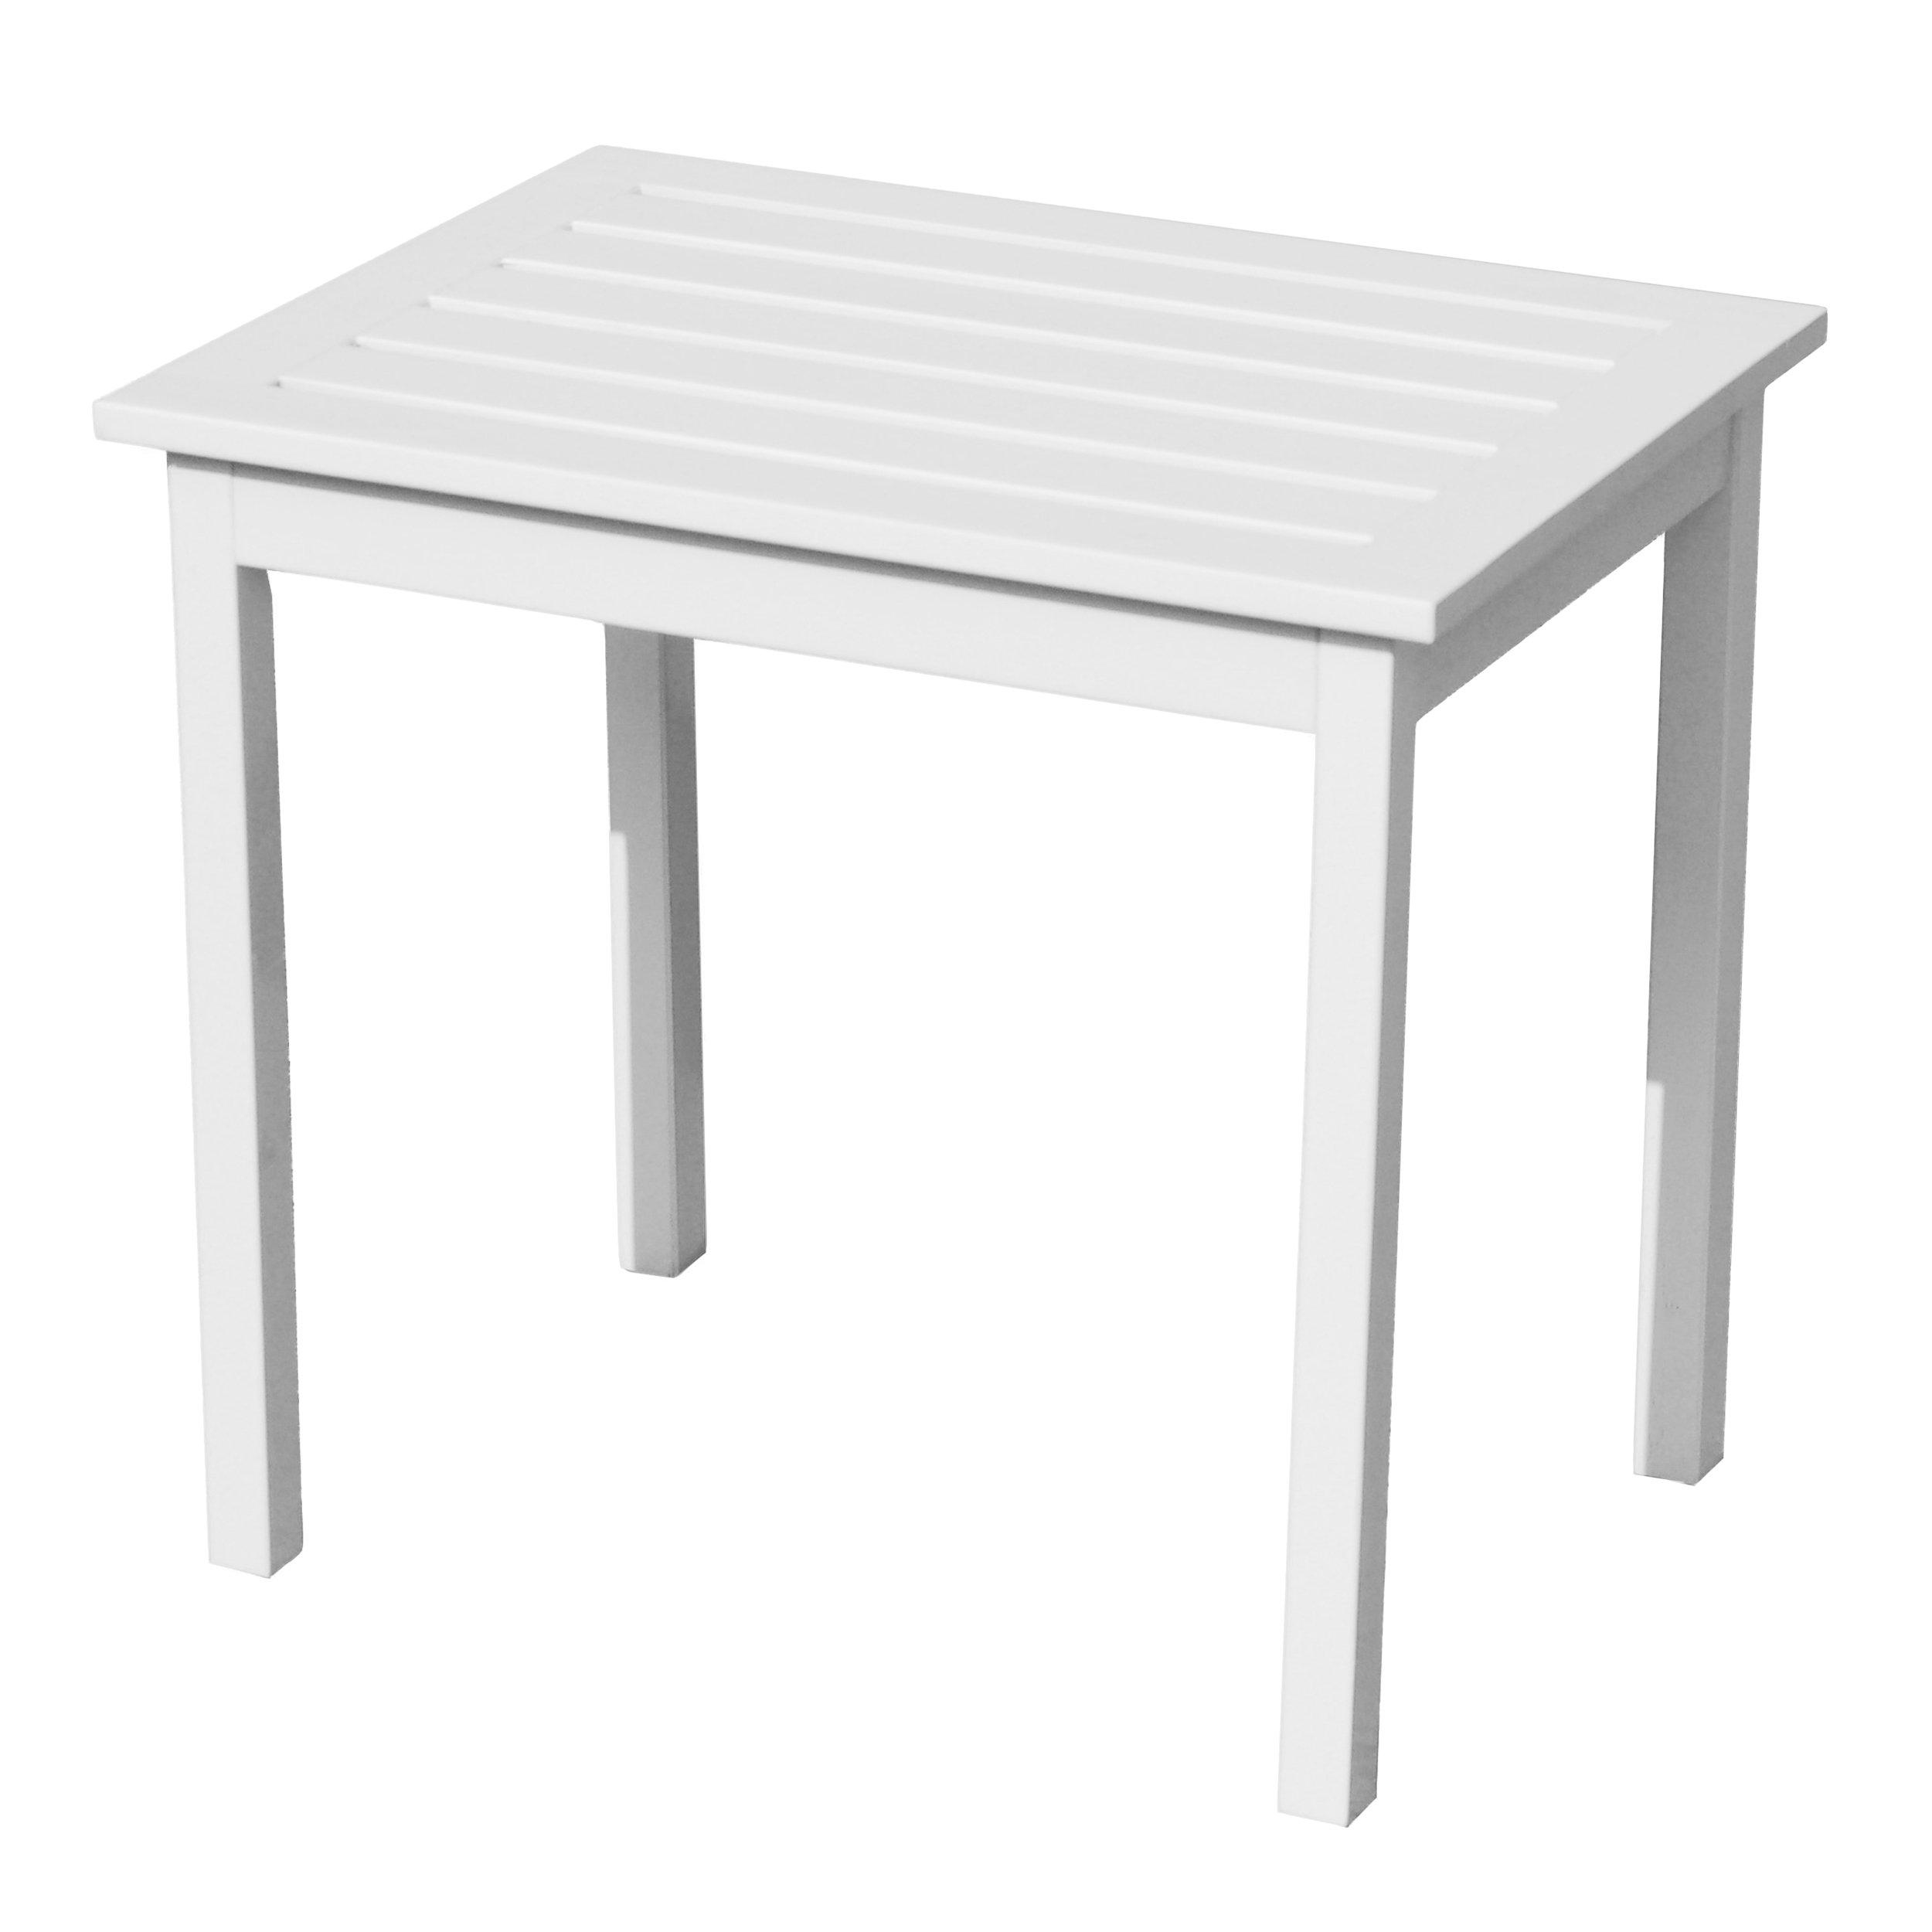 Southern Enterprises Hardwood Side End Table, Painted White Finish